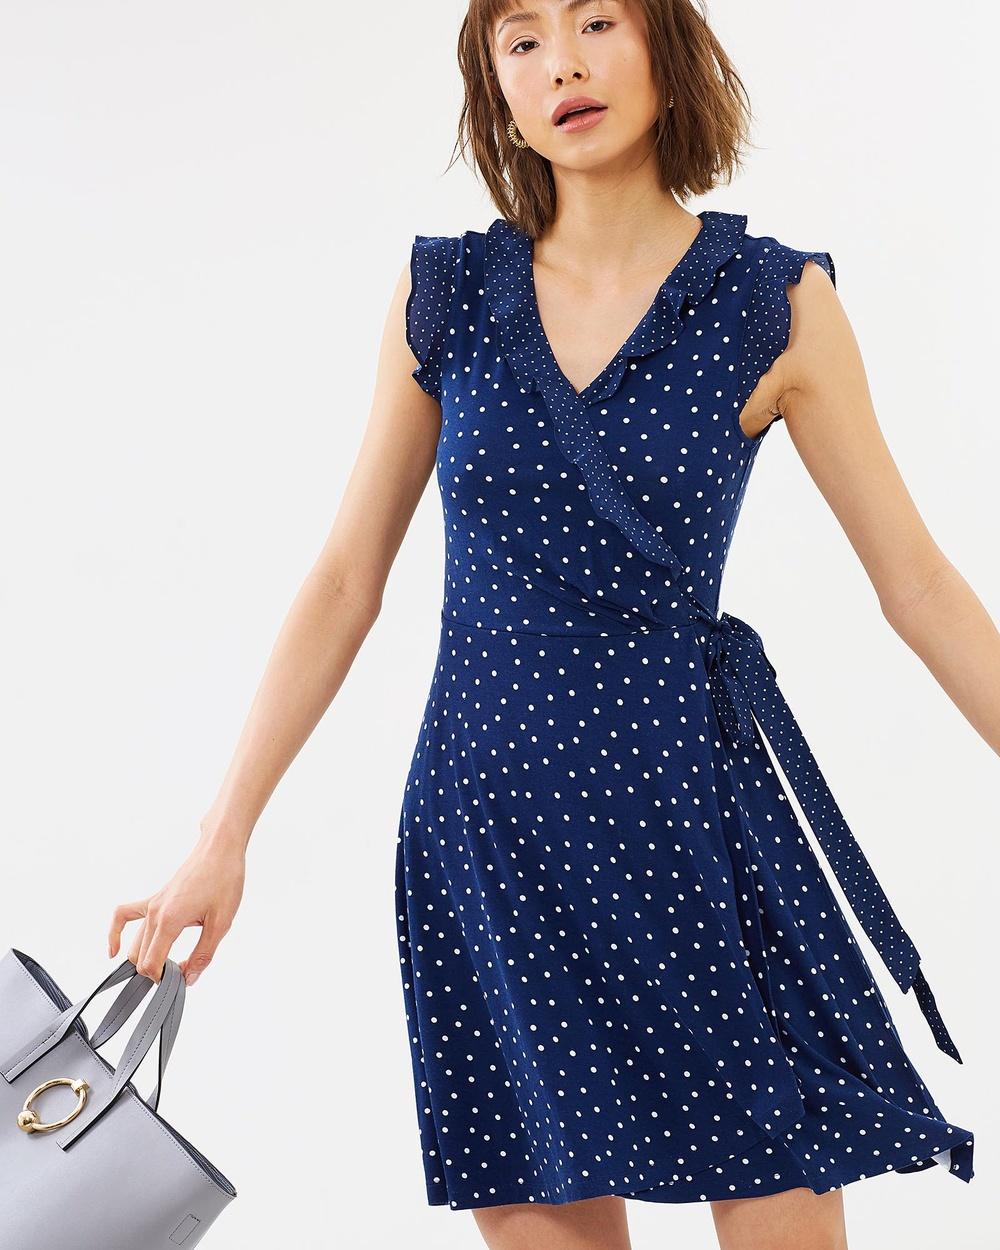 Marcs NAVY/IVORY Silk Trim Spot Wrap Dress